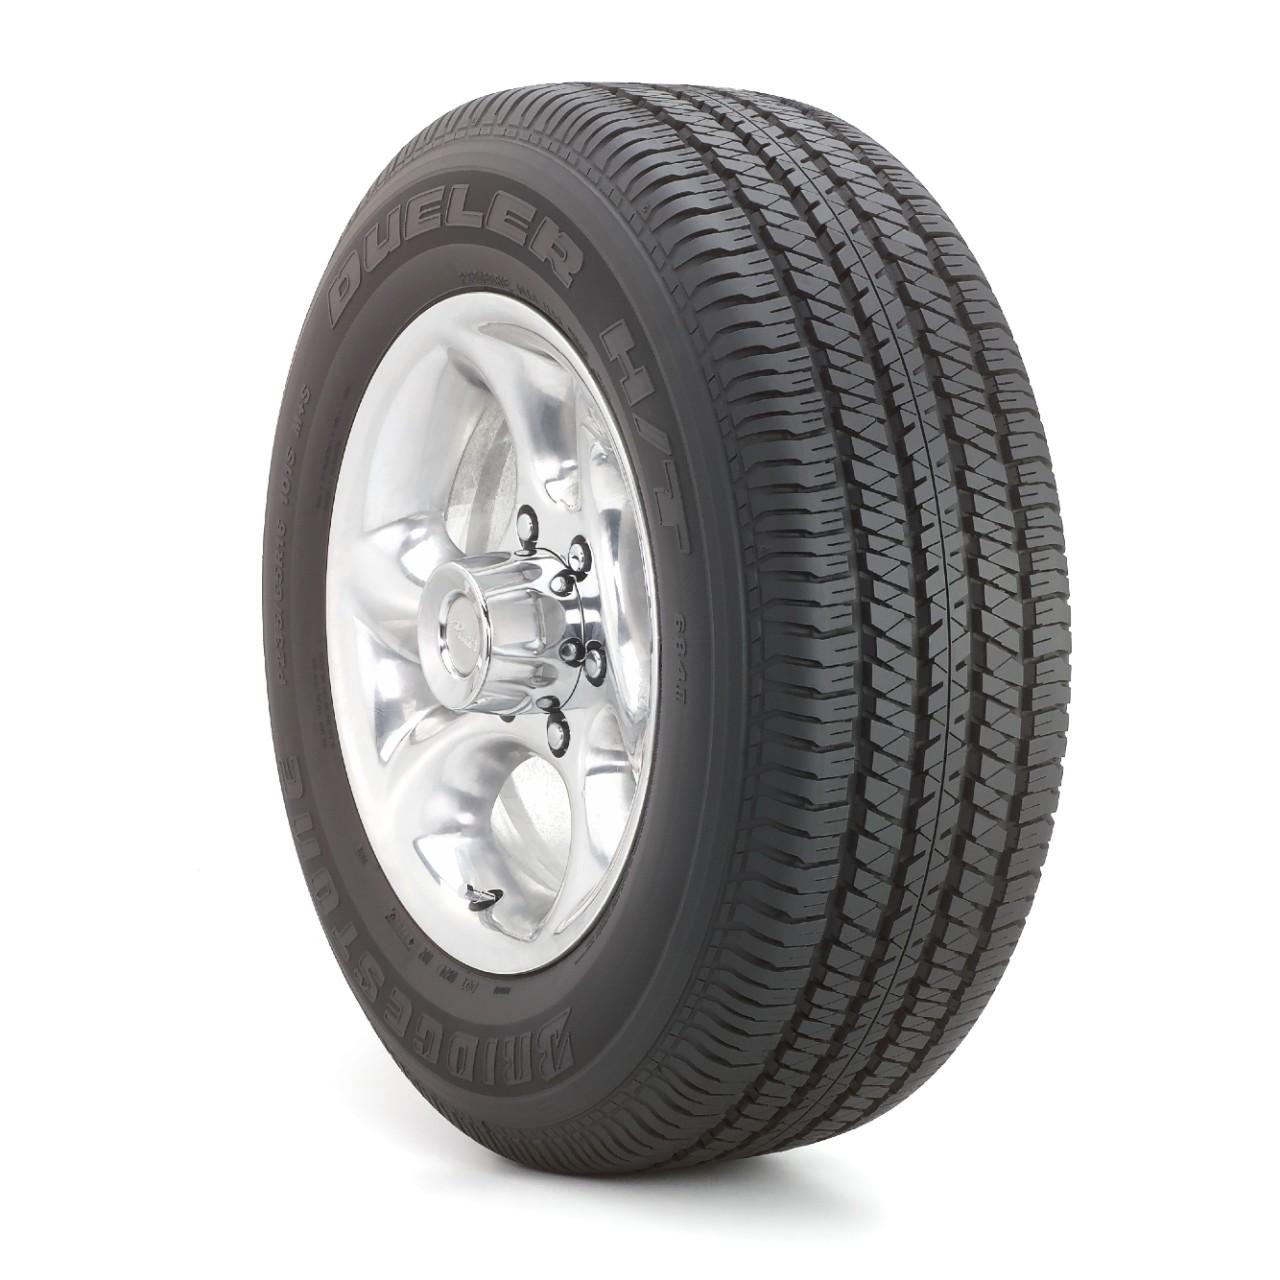 Neumático BRIDGESTONE D684 II 195/80R15 96 S